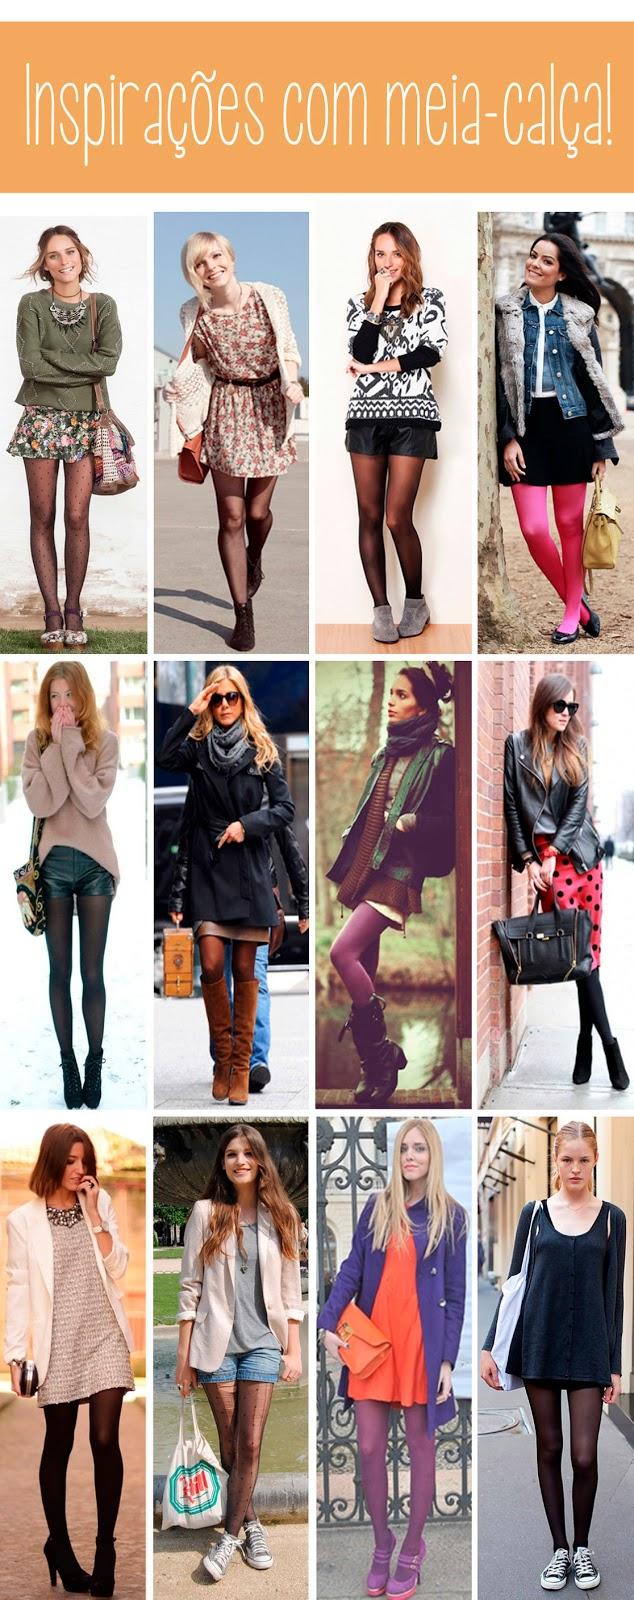 farm, moda, fashion, trabalho, casual, elegante, festa